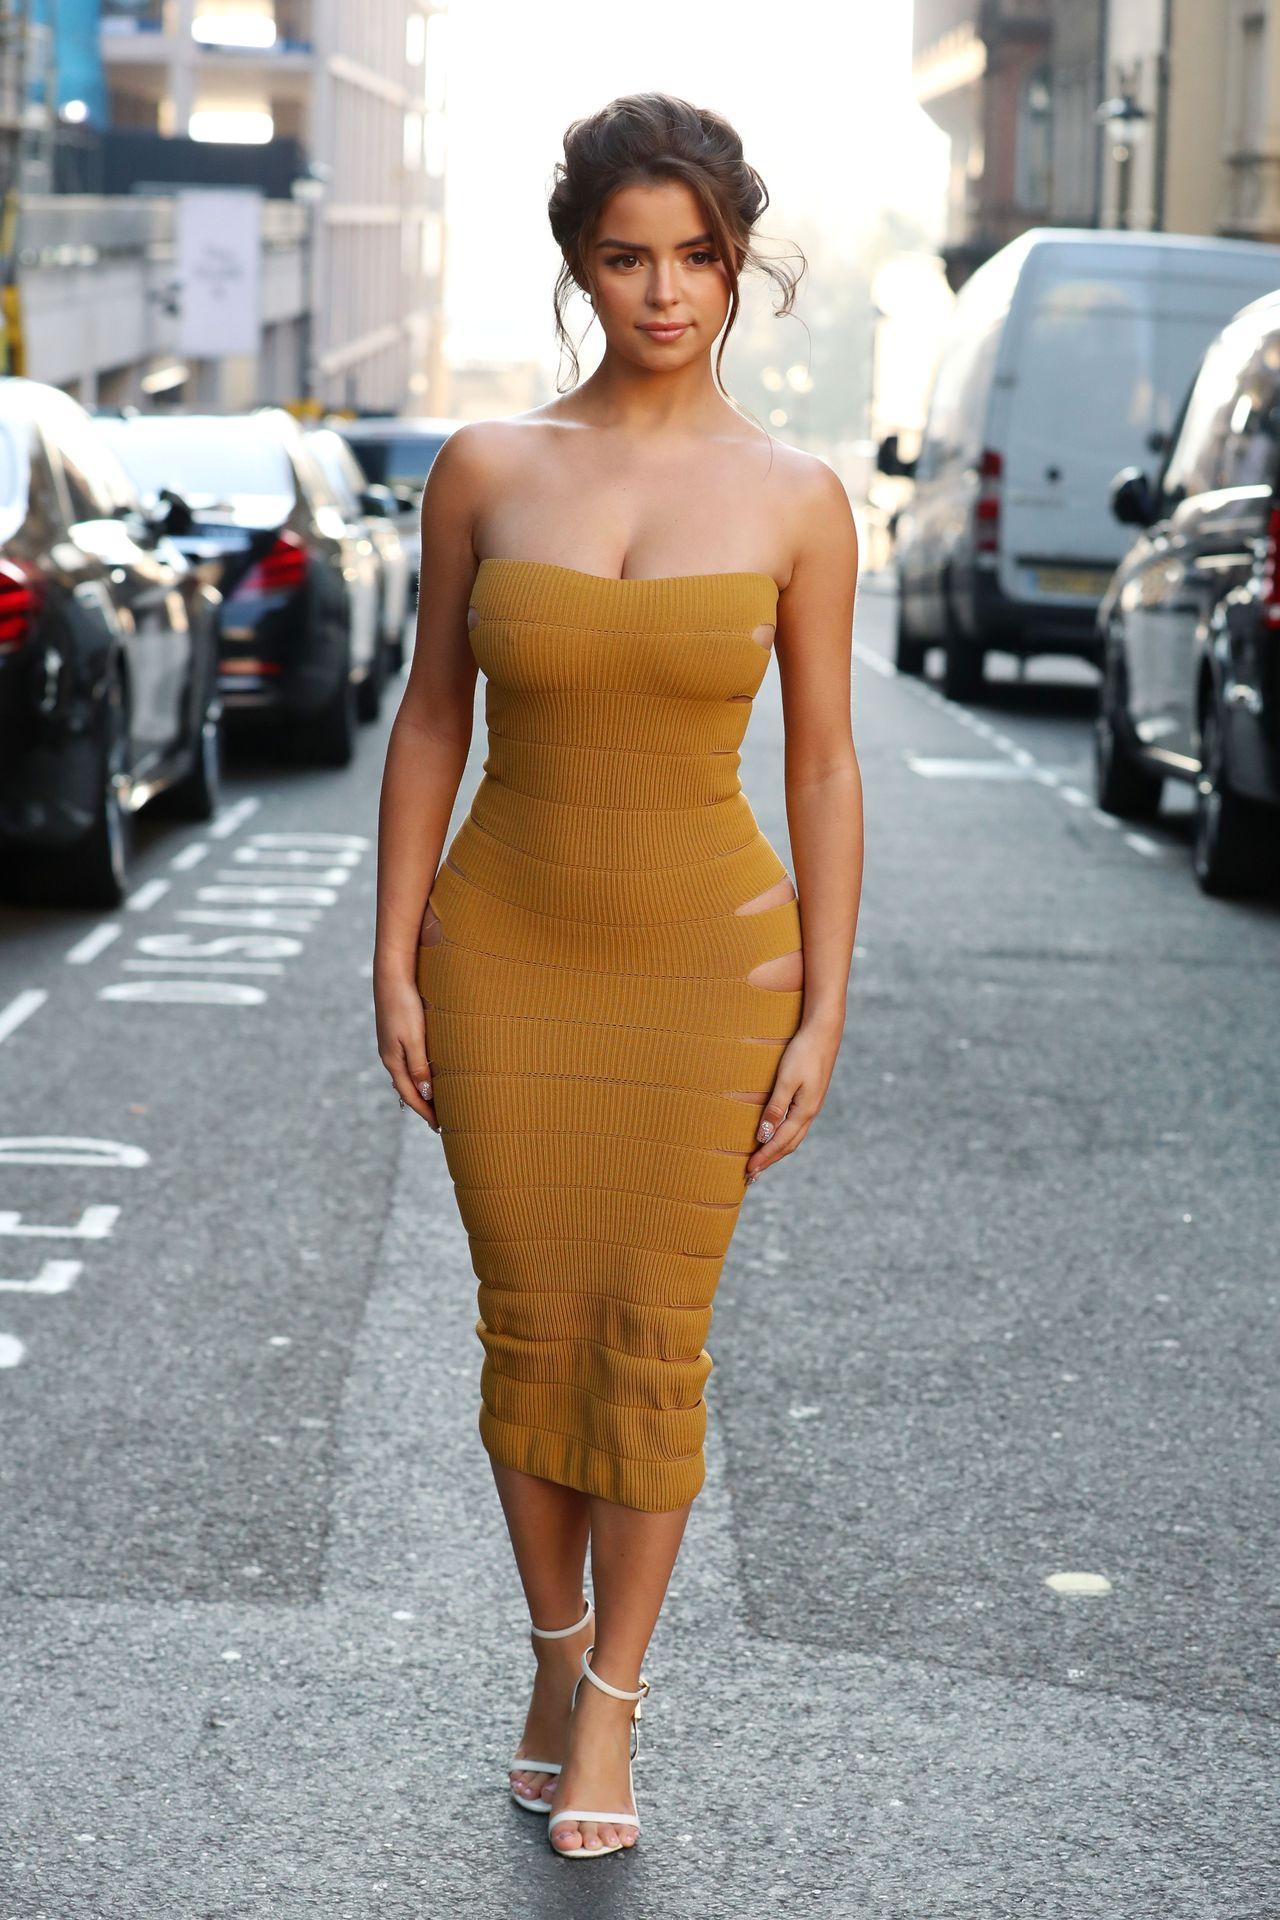 Car Wallpapers Netcarshow Wallpaper Demi Rose Mawby Model Curvy Bare Shoulders